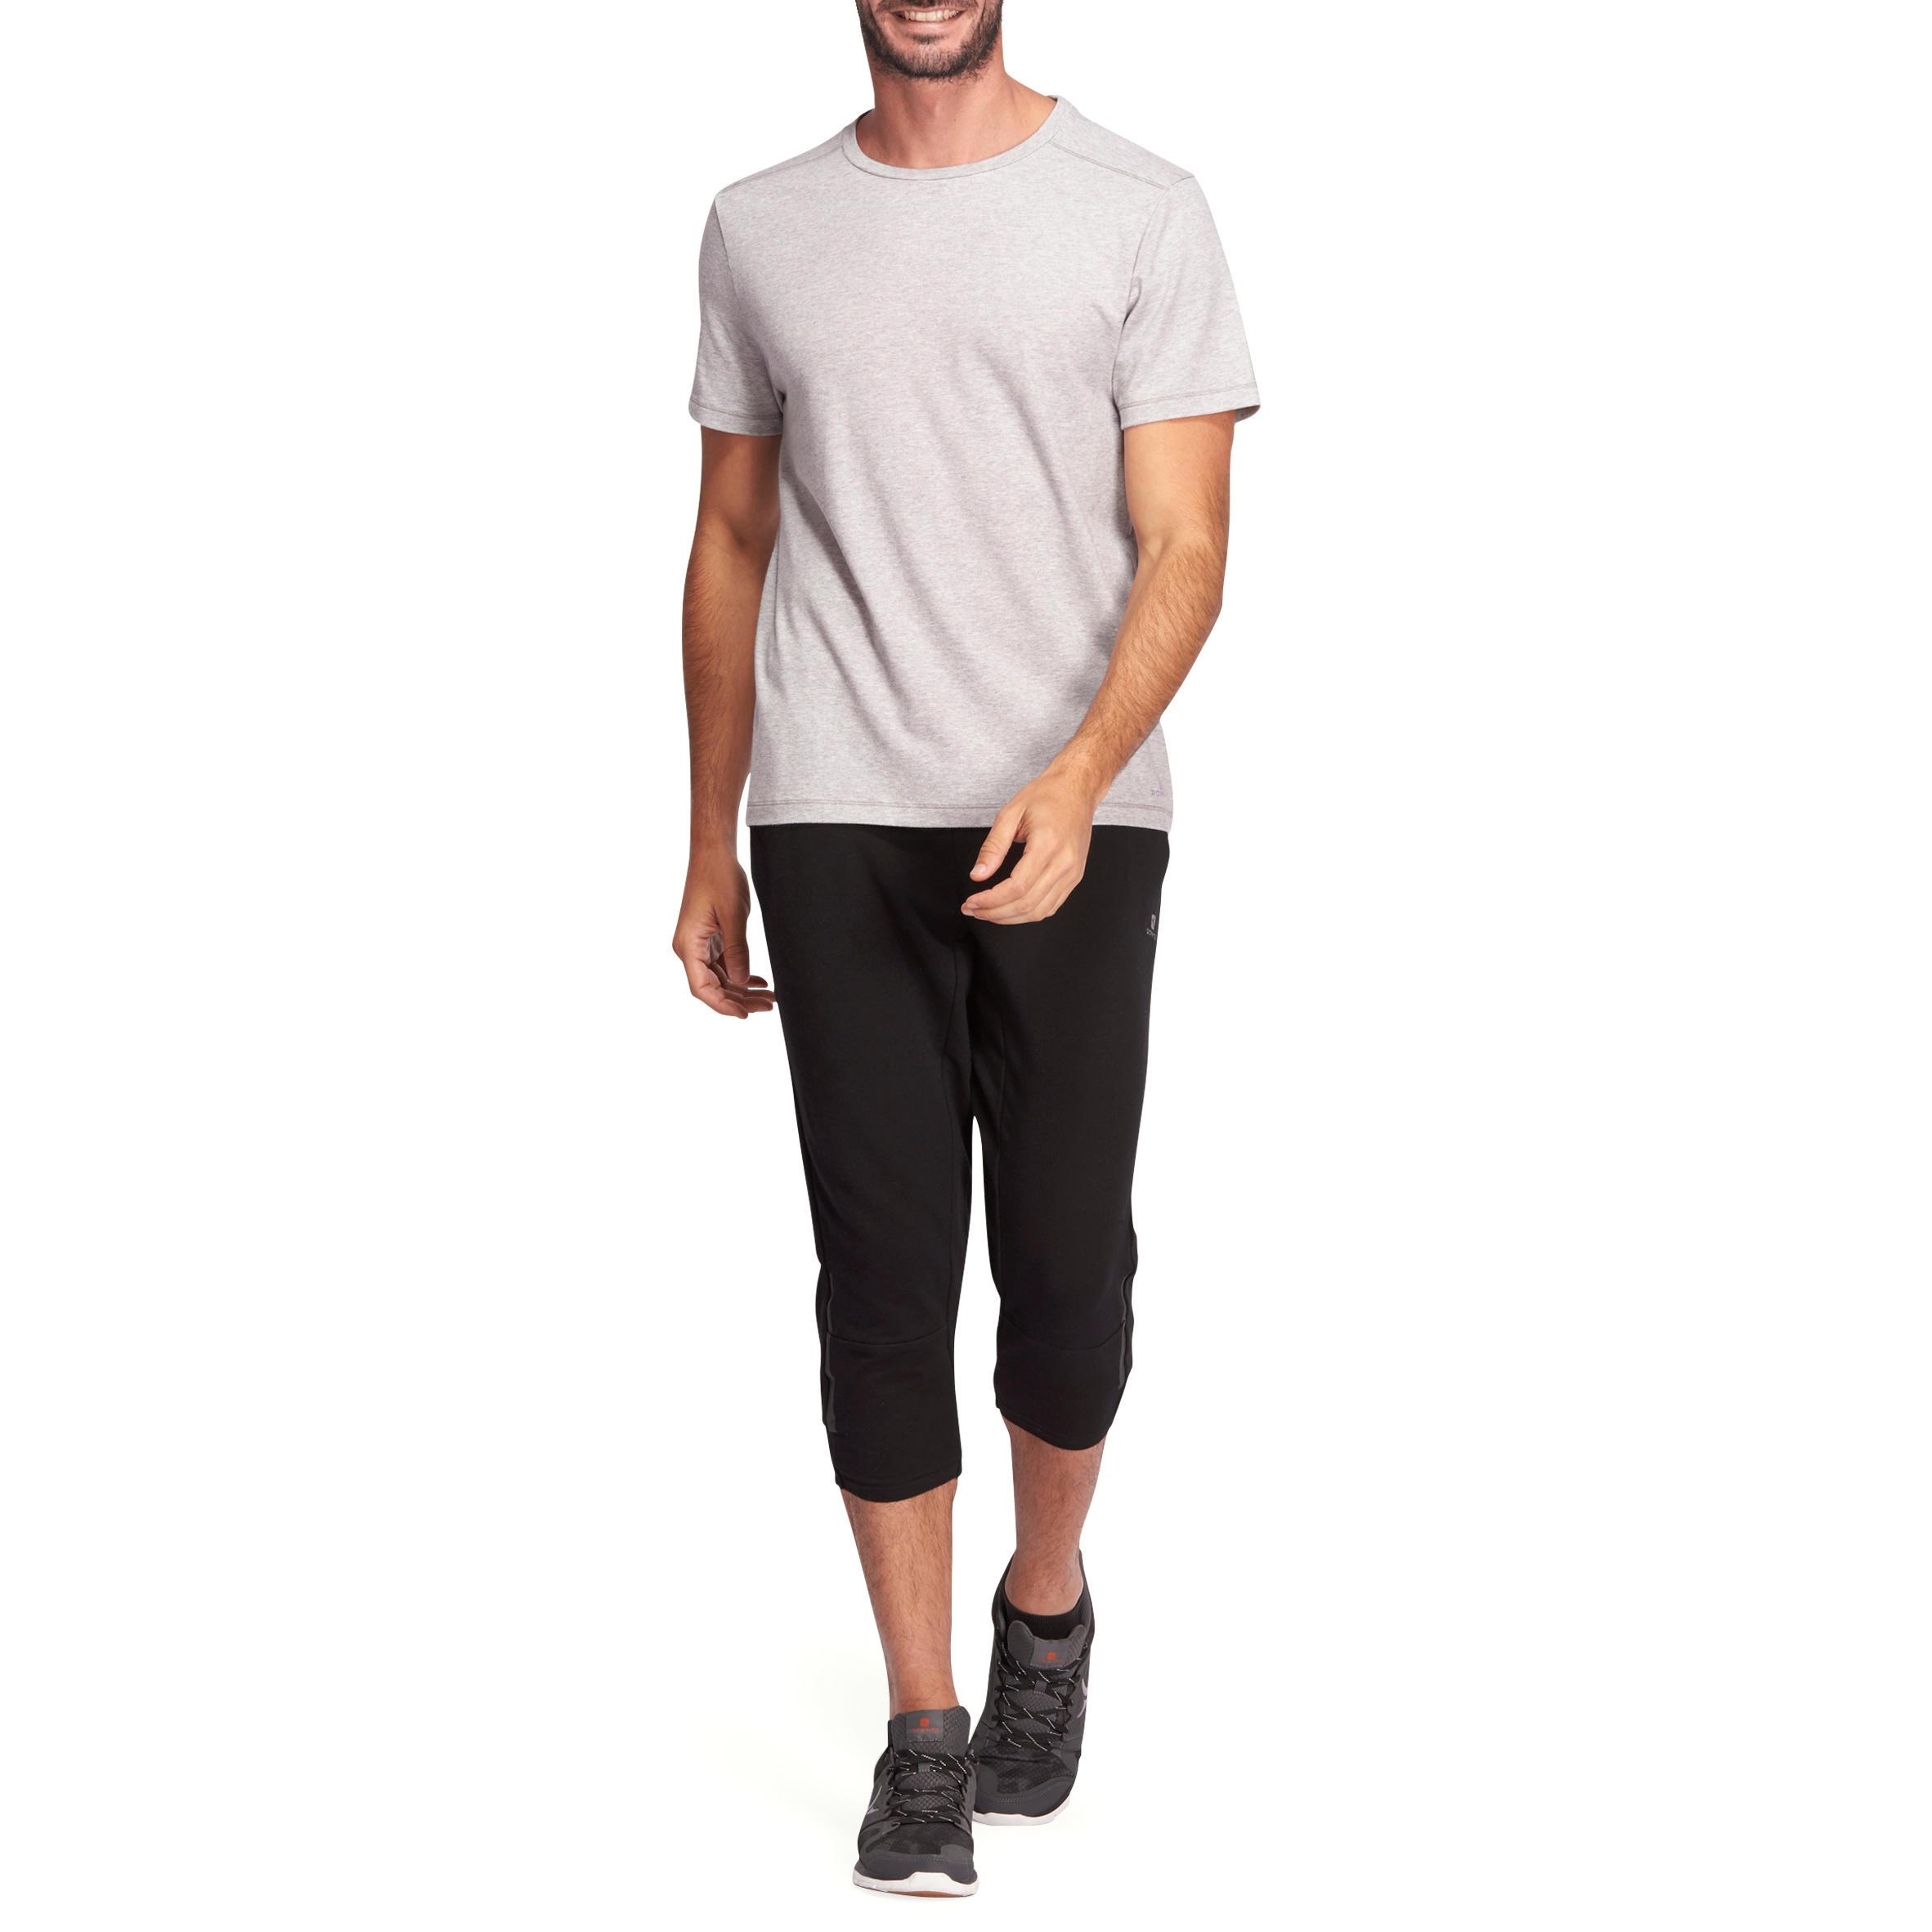 T-Shirt 500 regular Pilates Gym douce homme gris clair